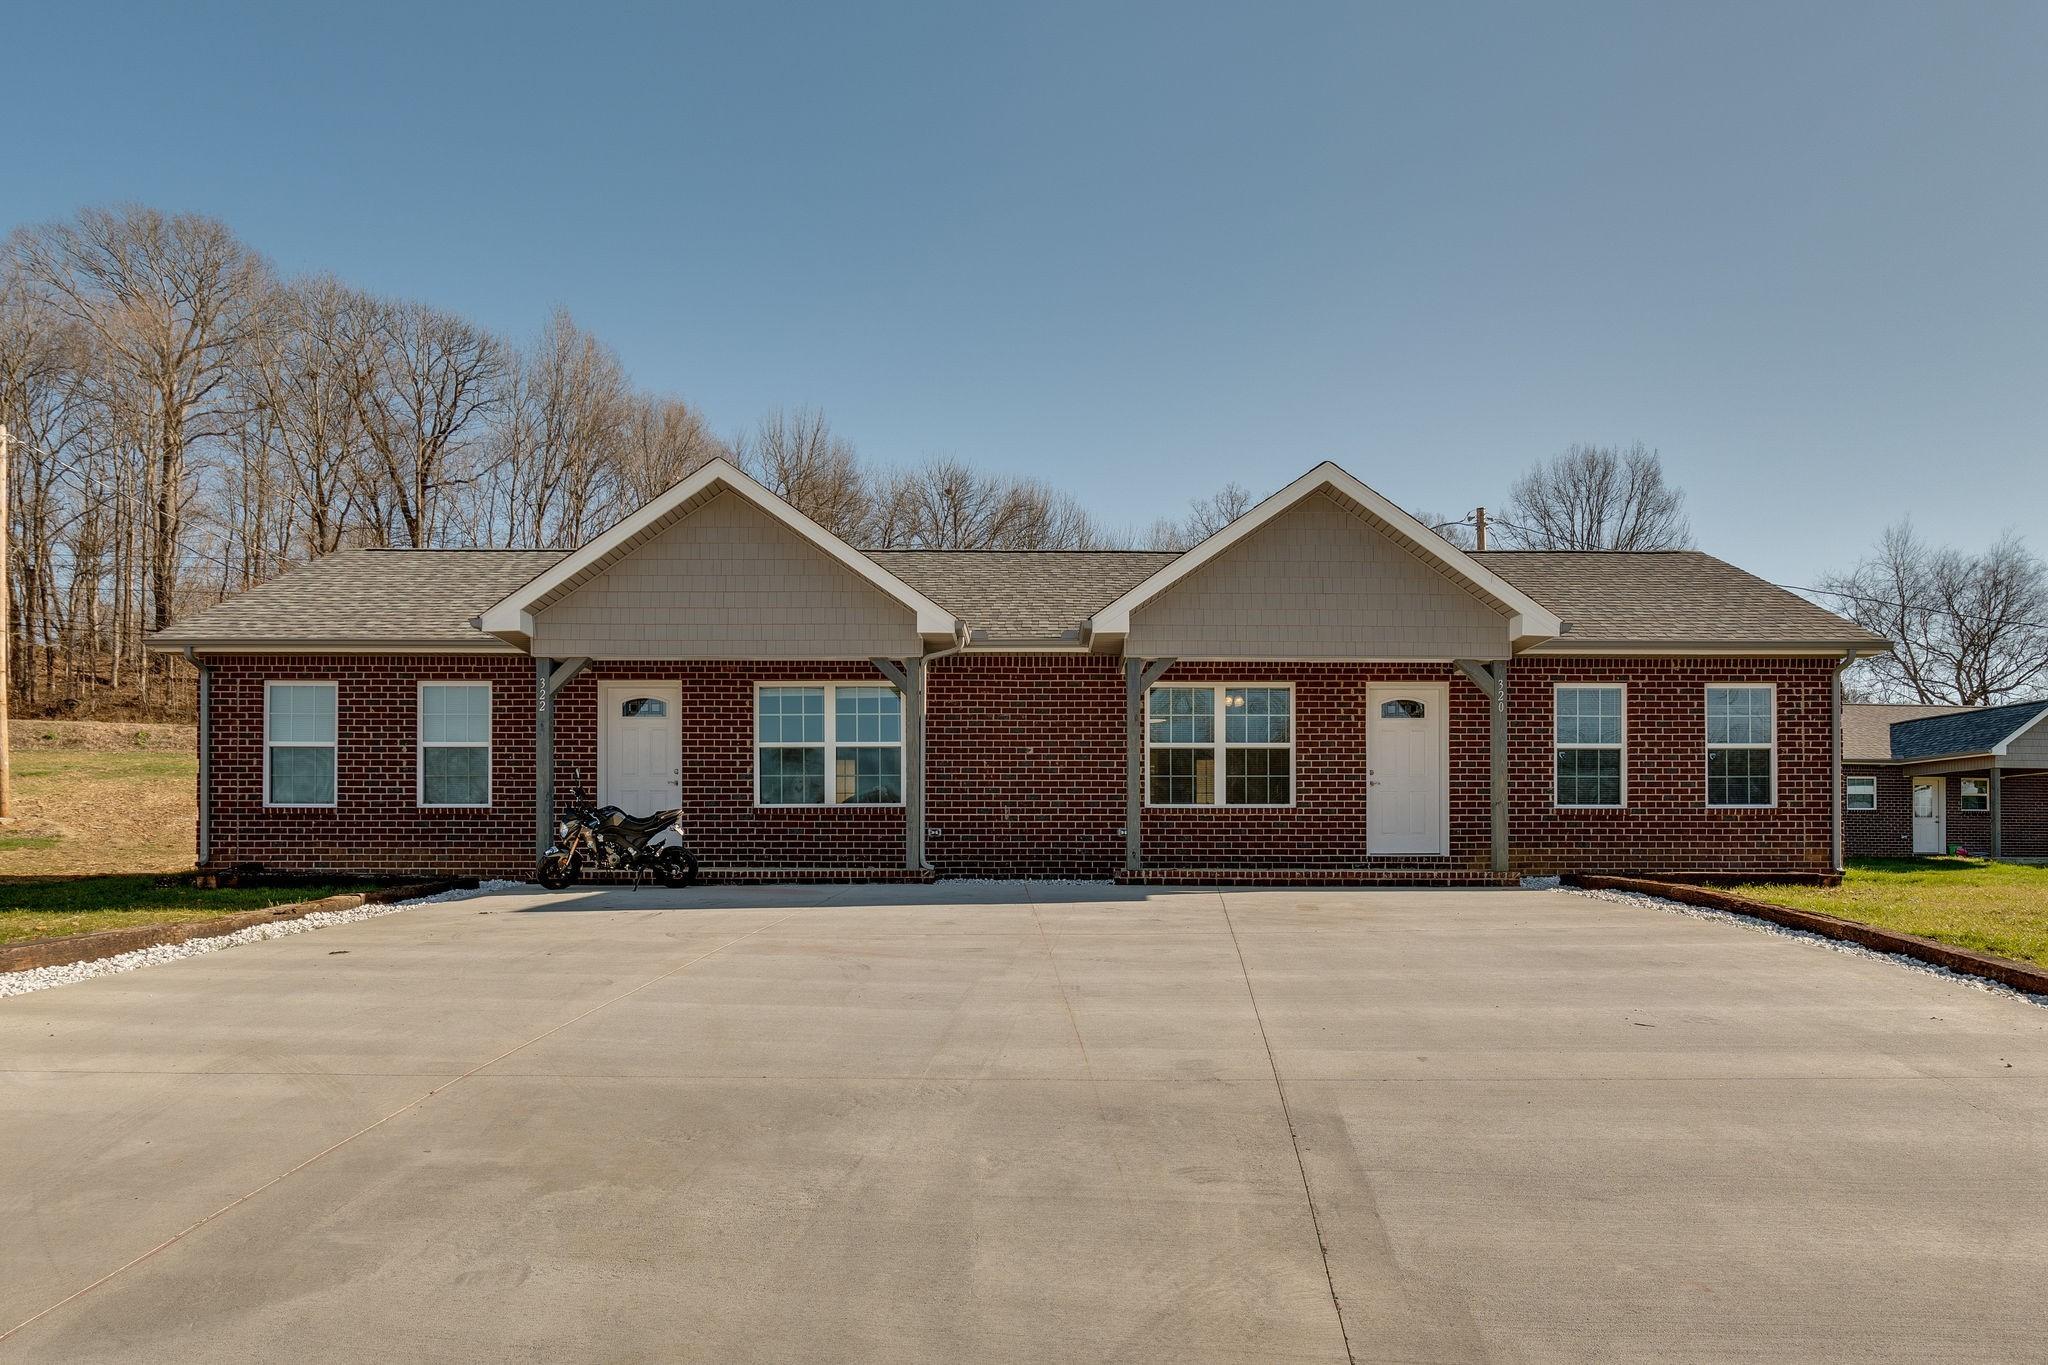 320 Blackman Blvd E Property Photo - Wartrace, TN real estate listing